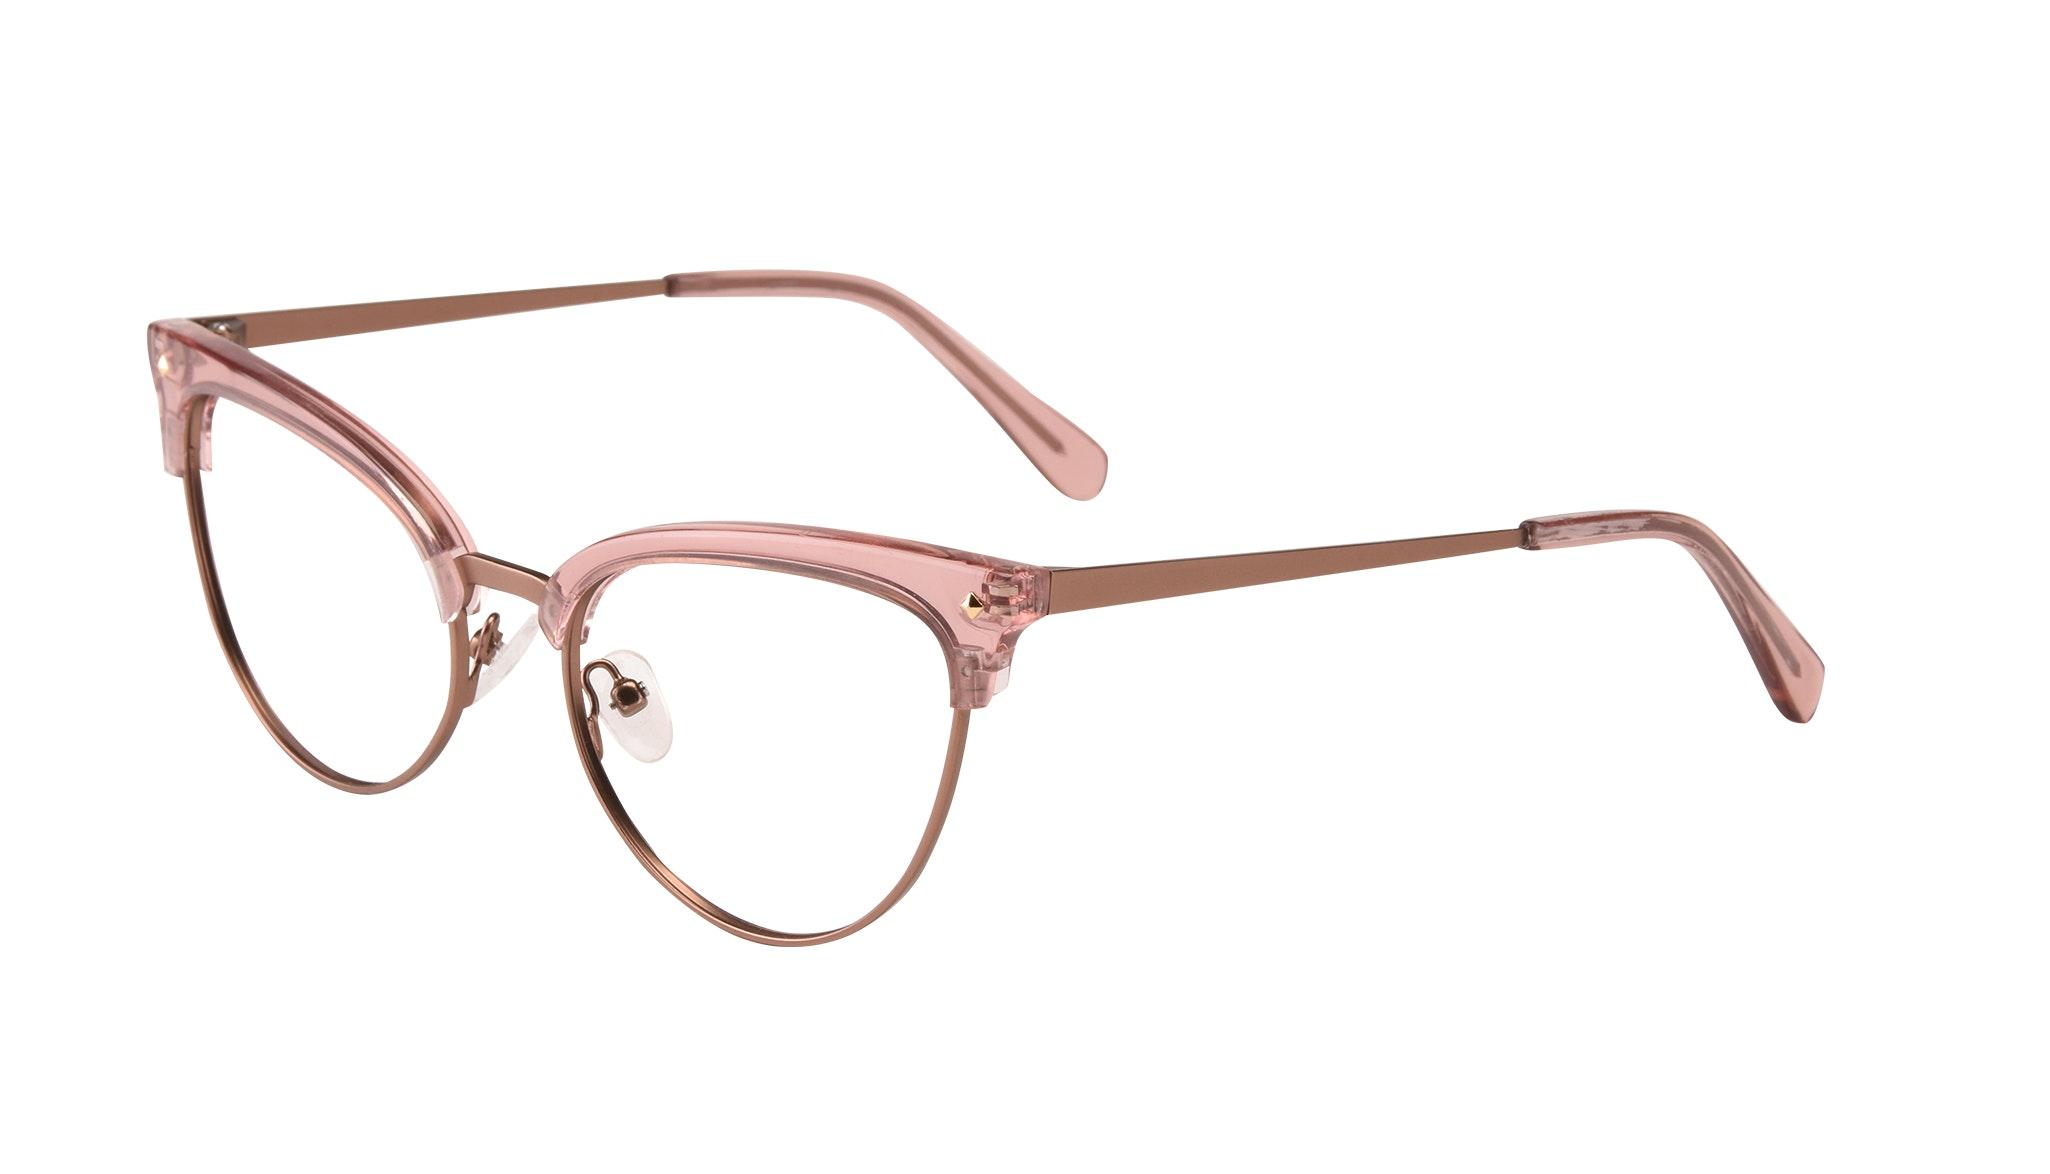 Affordable Fashion Glasses Cat Eye Daring Cateye Eyeglasses Women Moon Rose Tilt